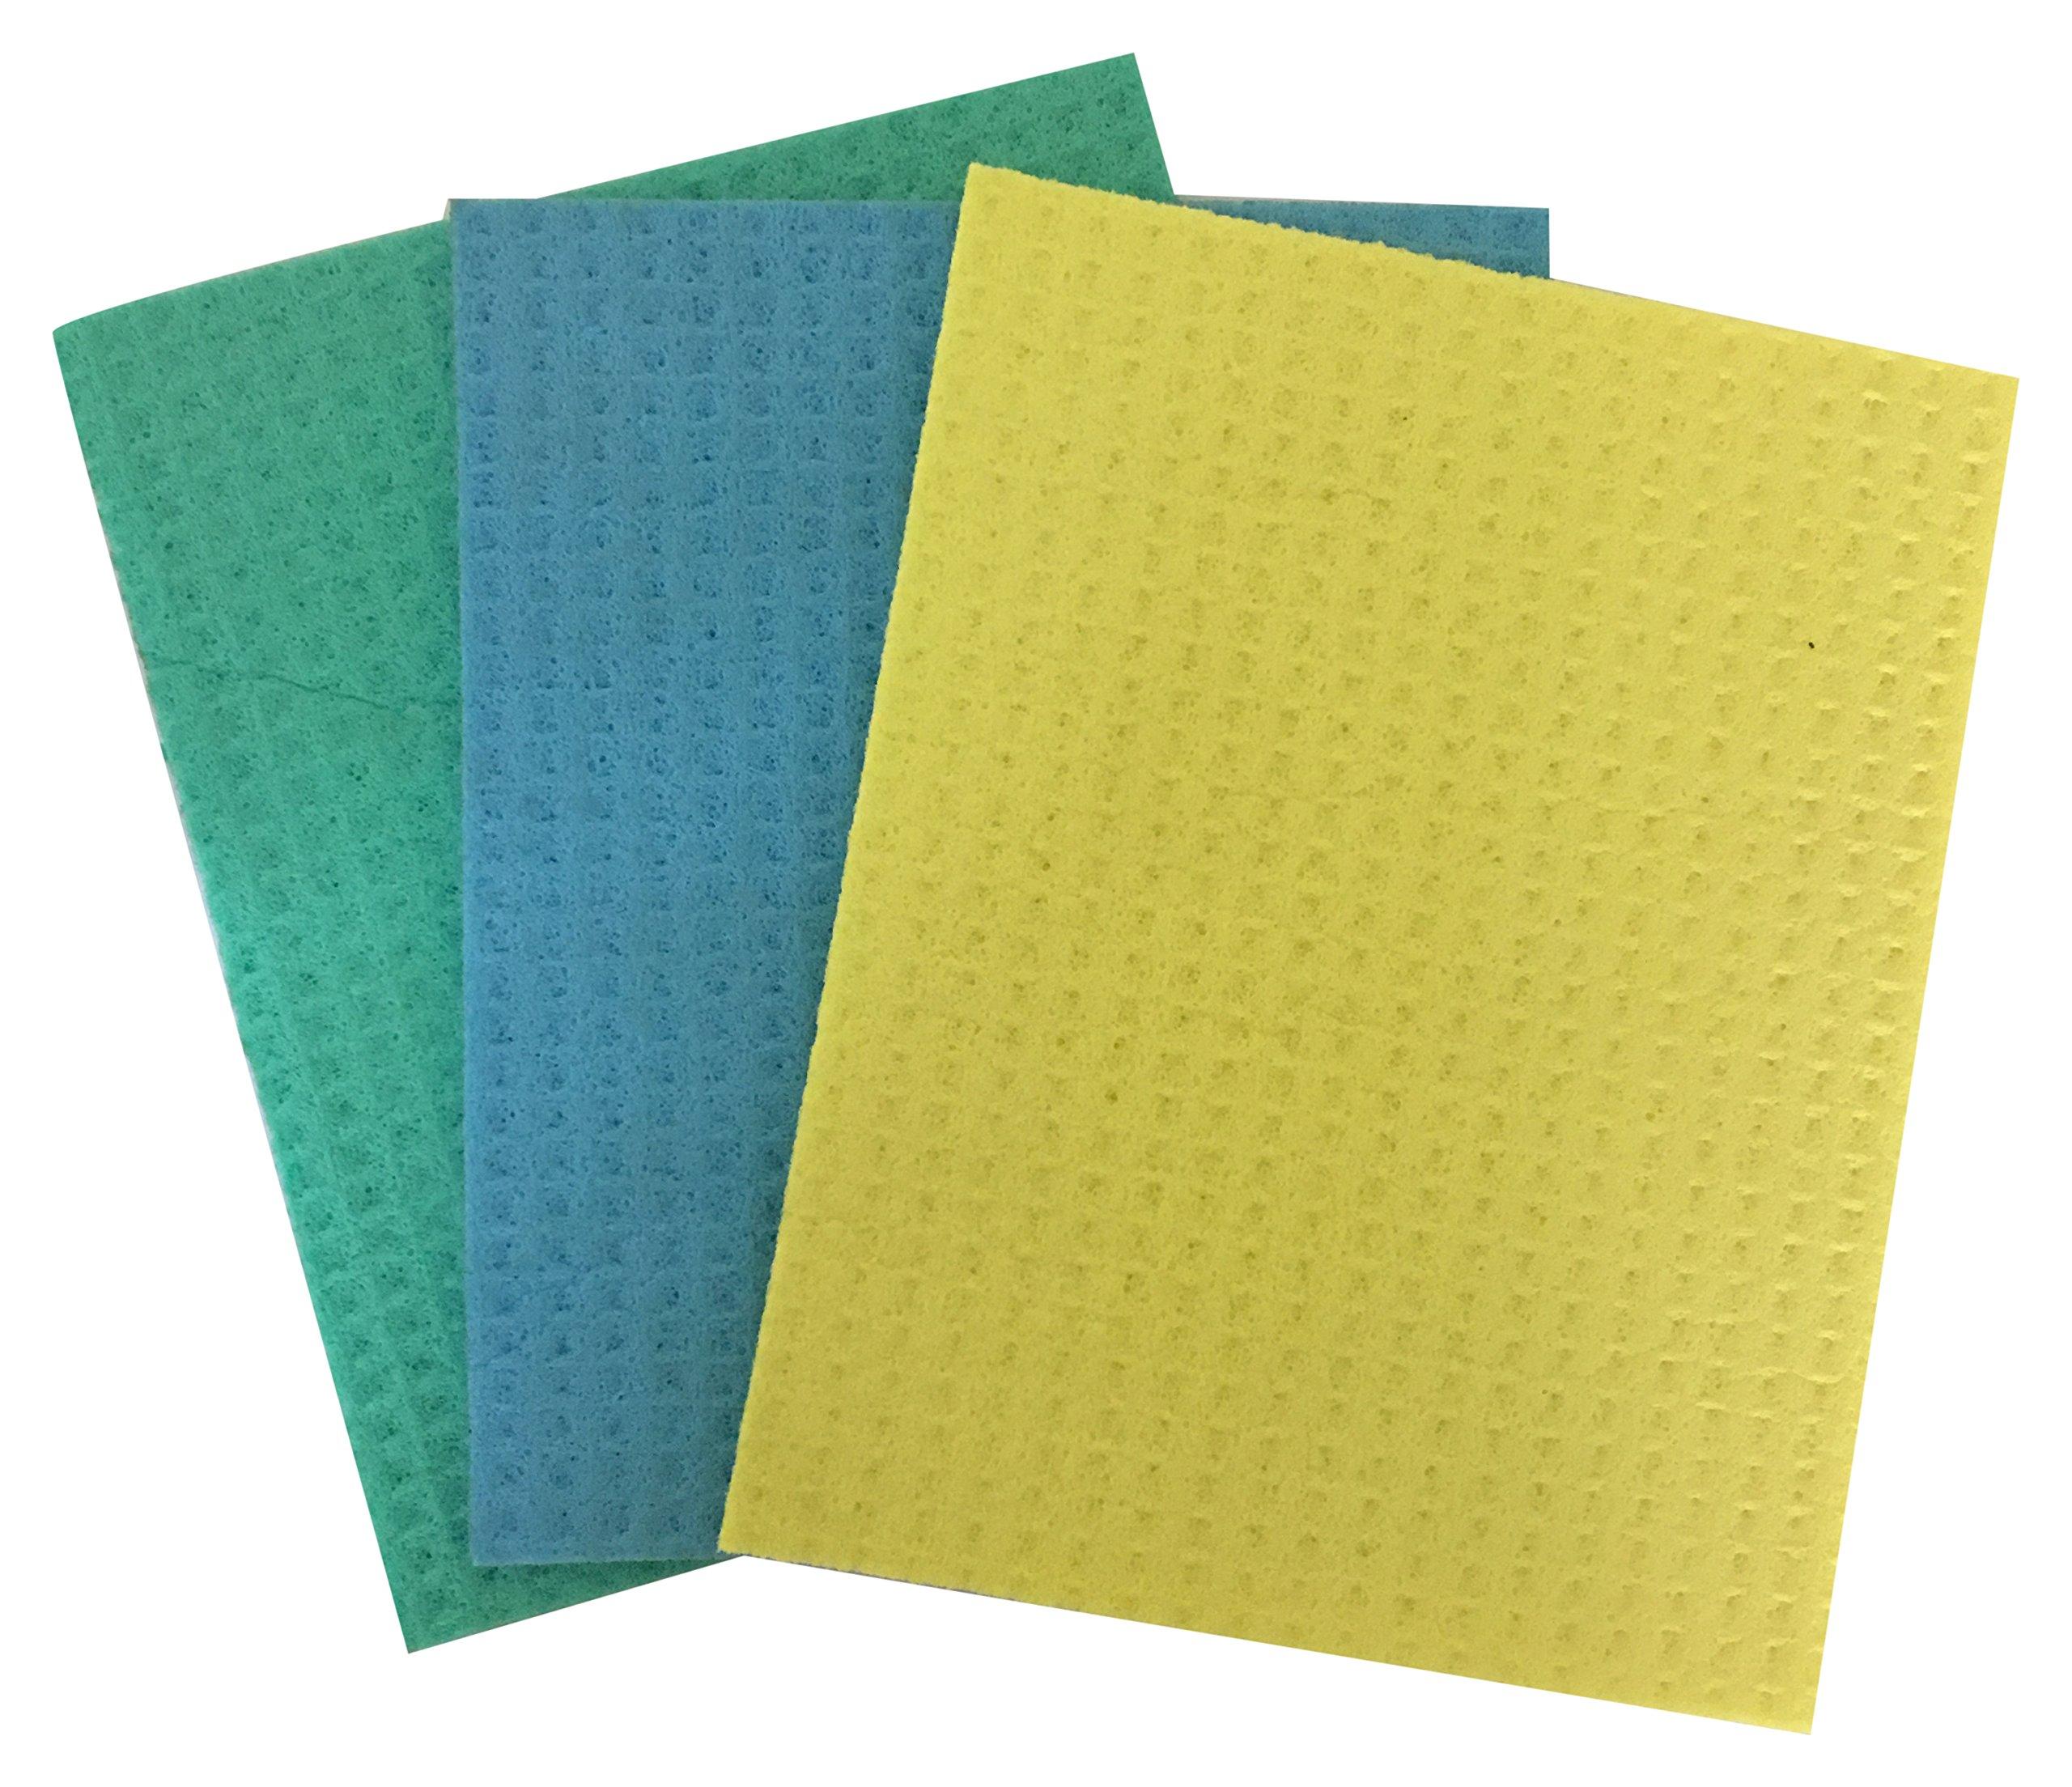 Brite Guard Cellulose Cleaning Sponge Mop (16 x 20 x 0.4 cm, Multicolour) - Pack of 3 (B07DK628KW) Amazon Price History, Amazon Price Tracker